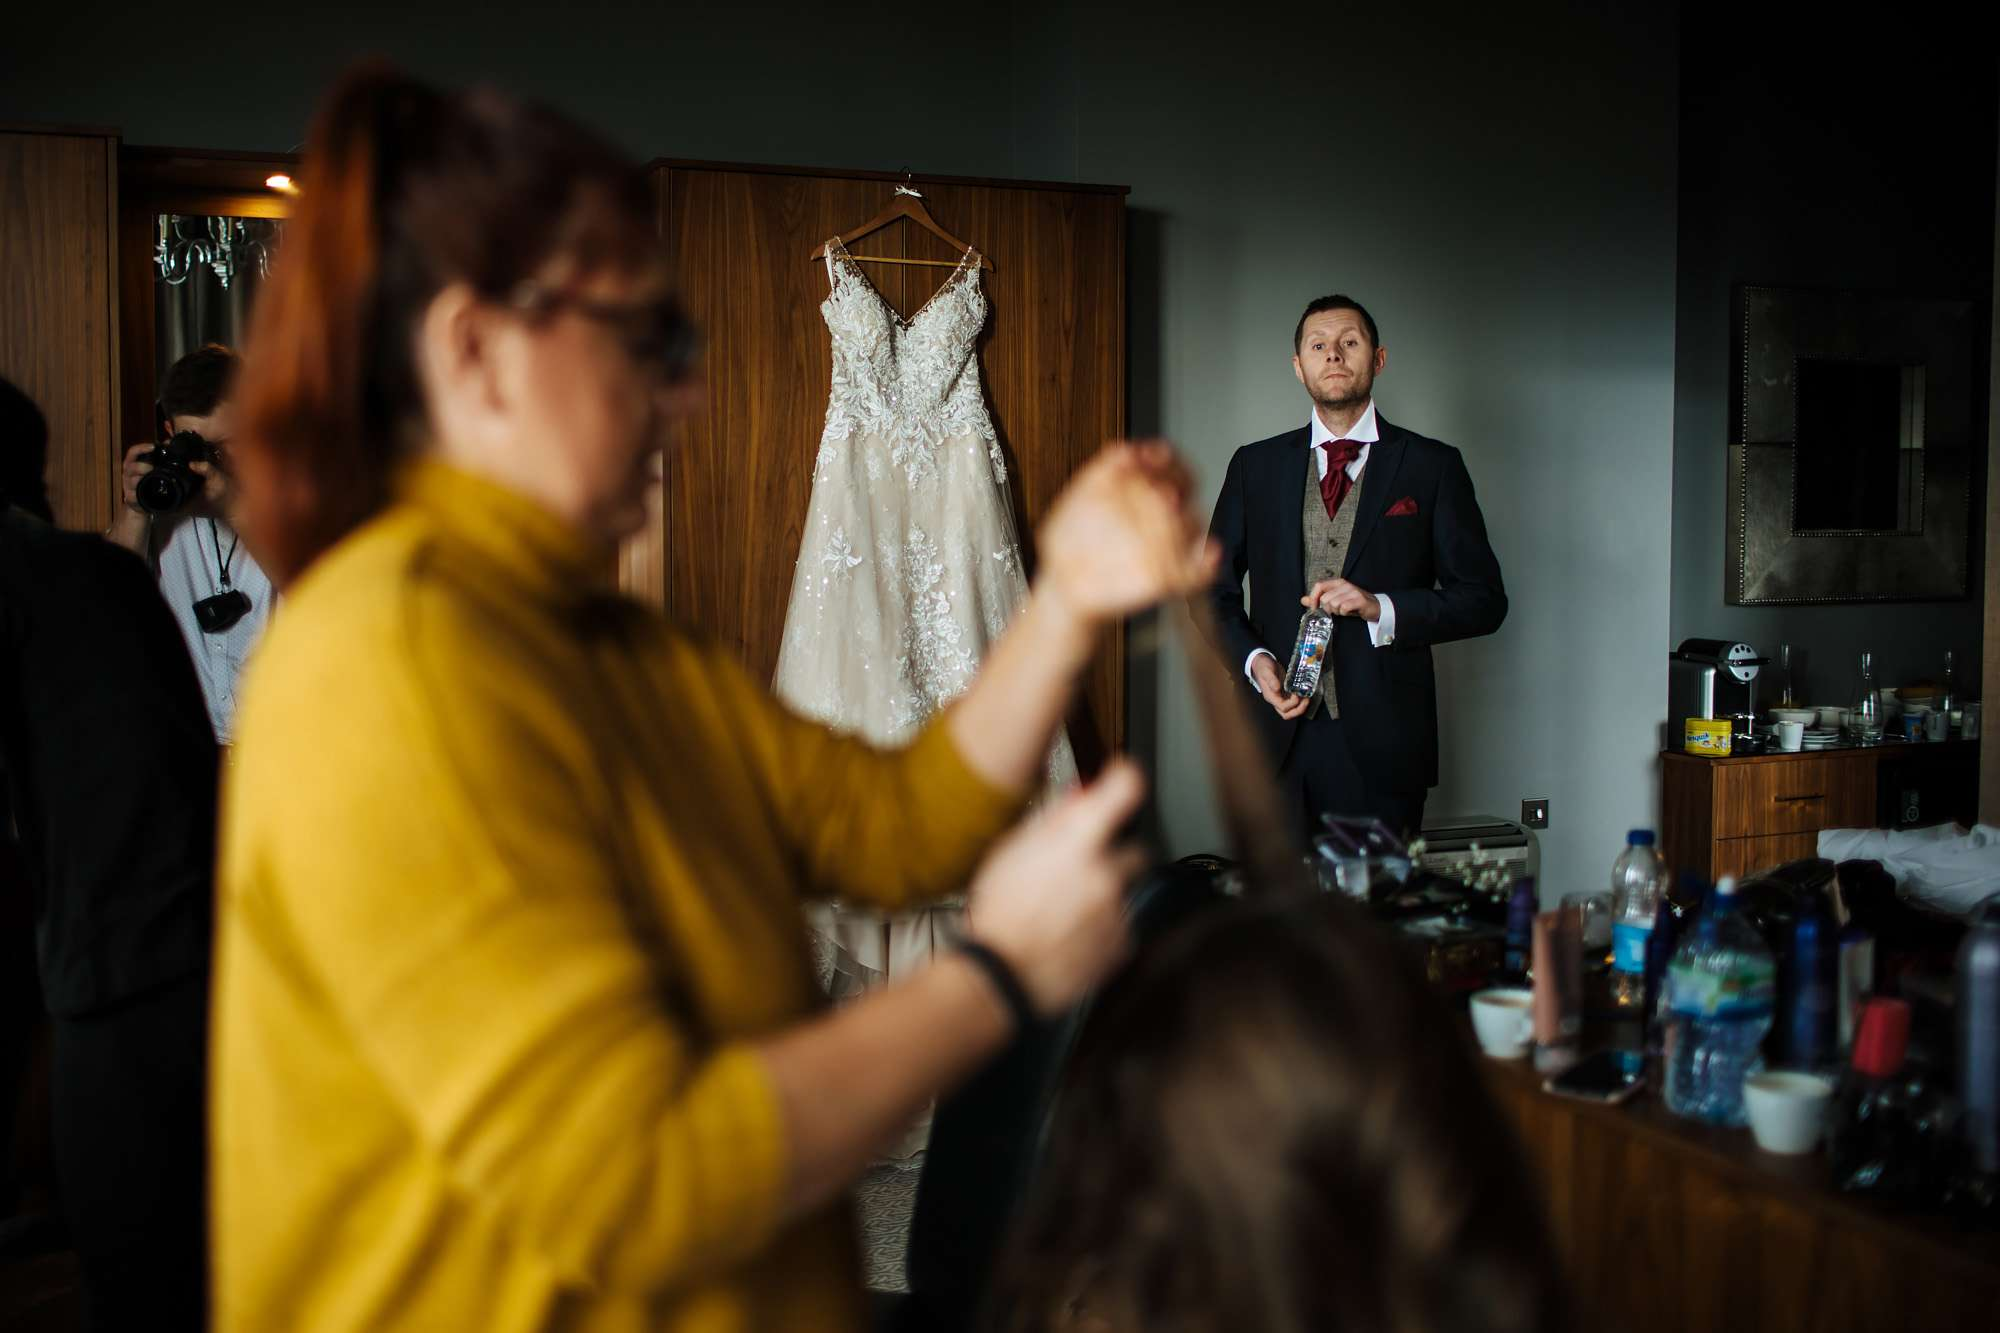 Groomsman on the wedding morning in Blackpool